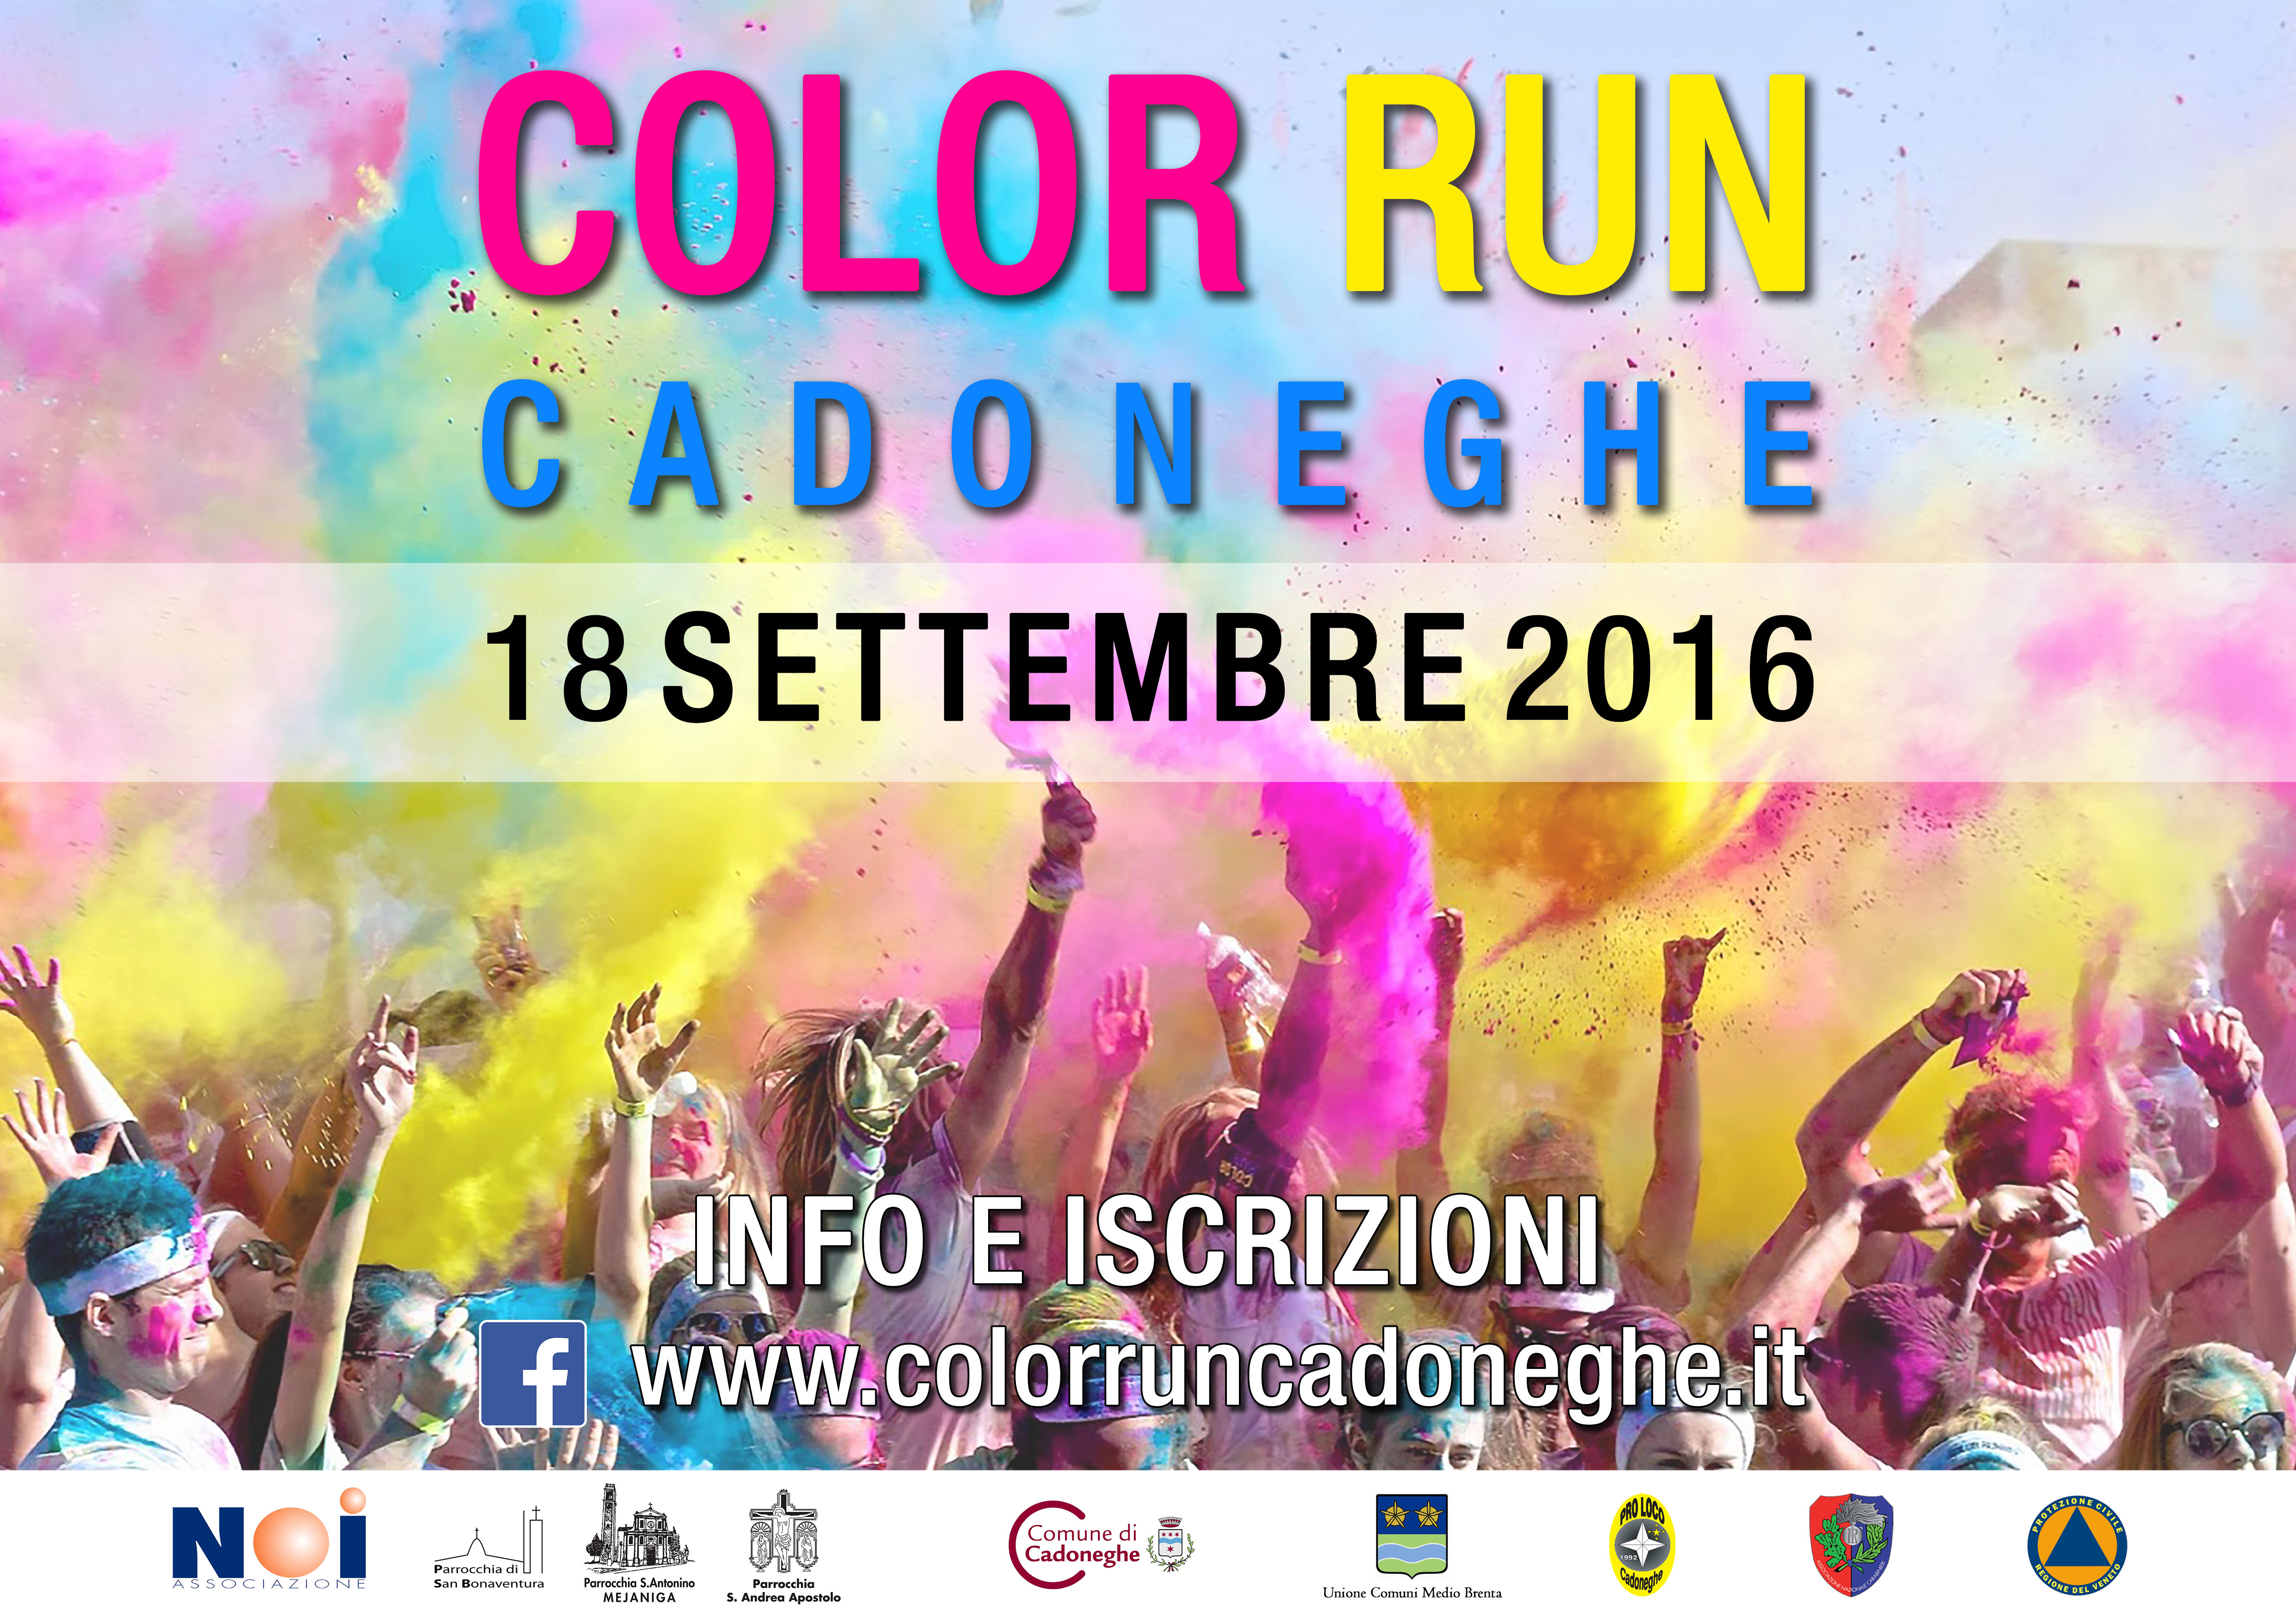 Color Run Cadoneghe: 18/09/2016